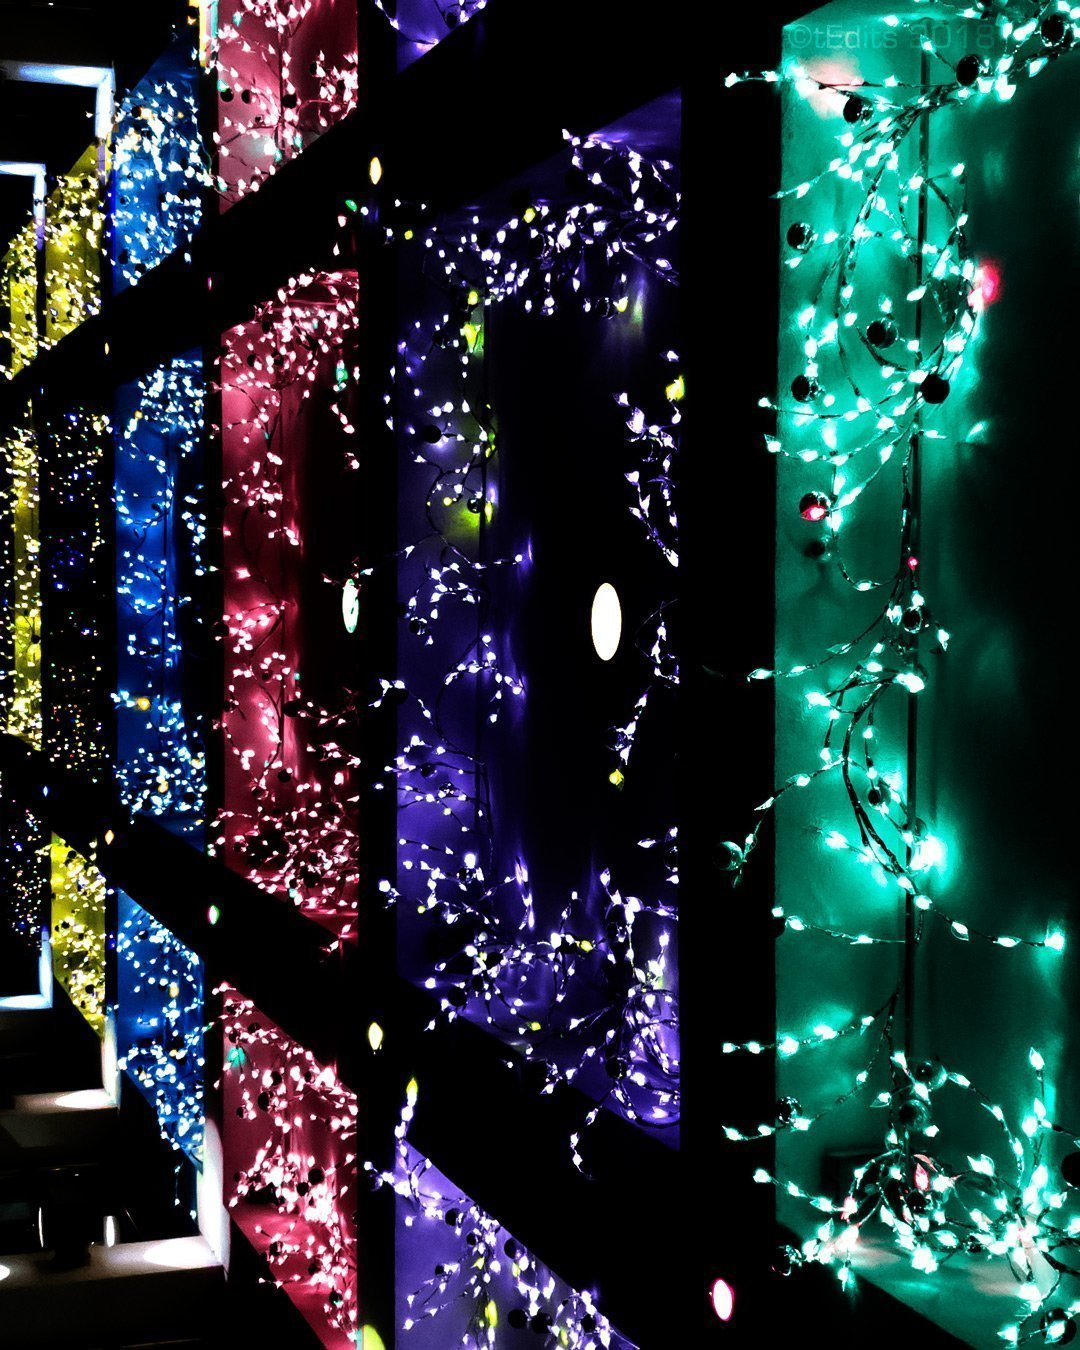 Covent Garden Lights